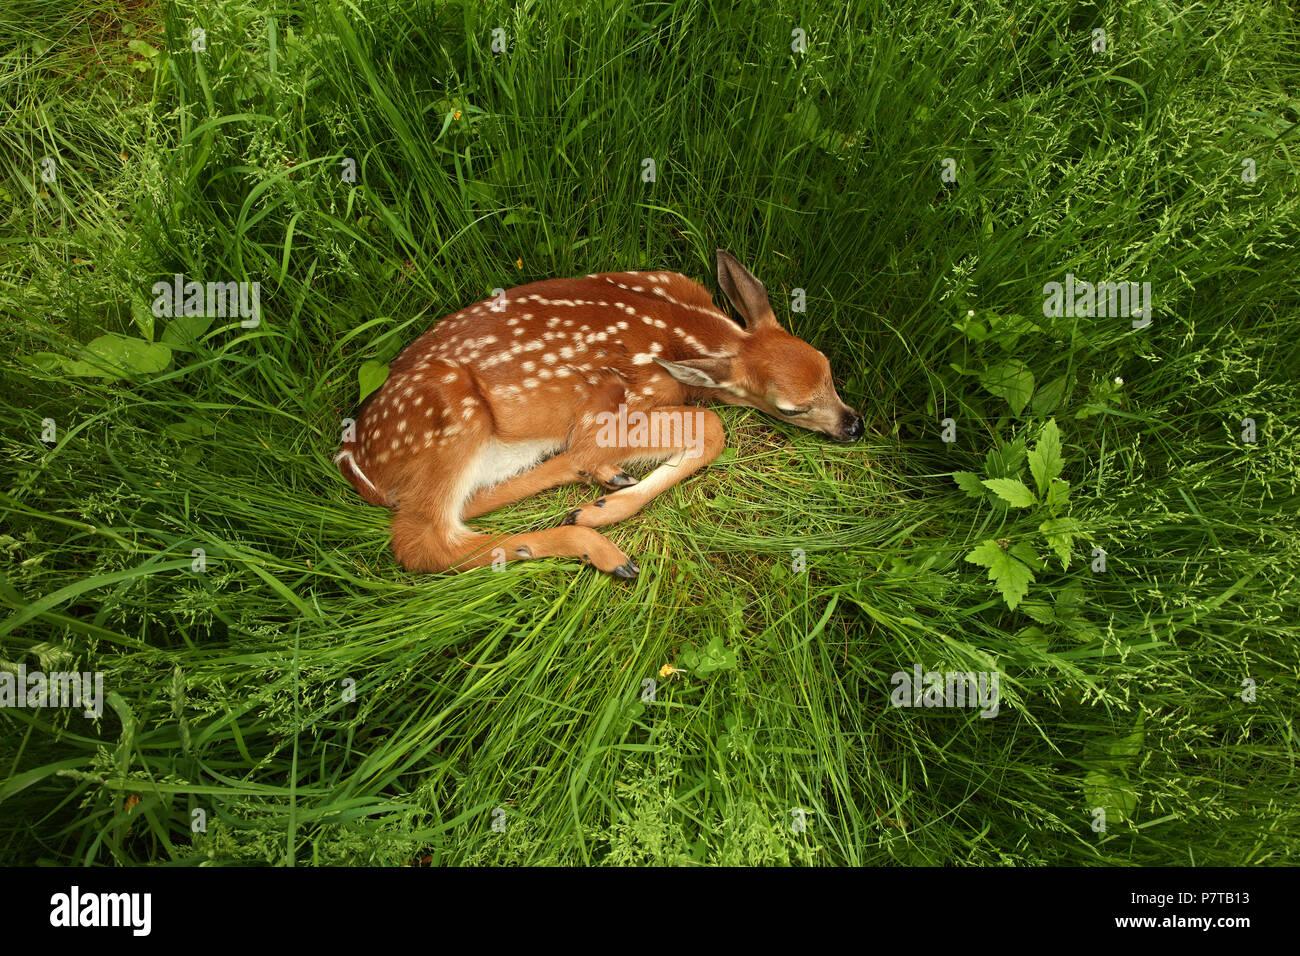 White white-tailed deer (Odocoileus virginianus), New York, fawn Stock Photo